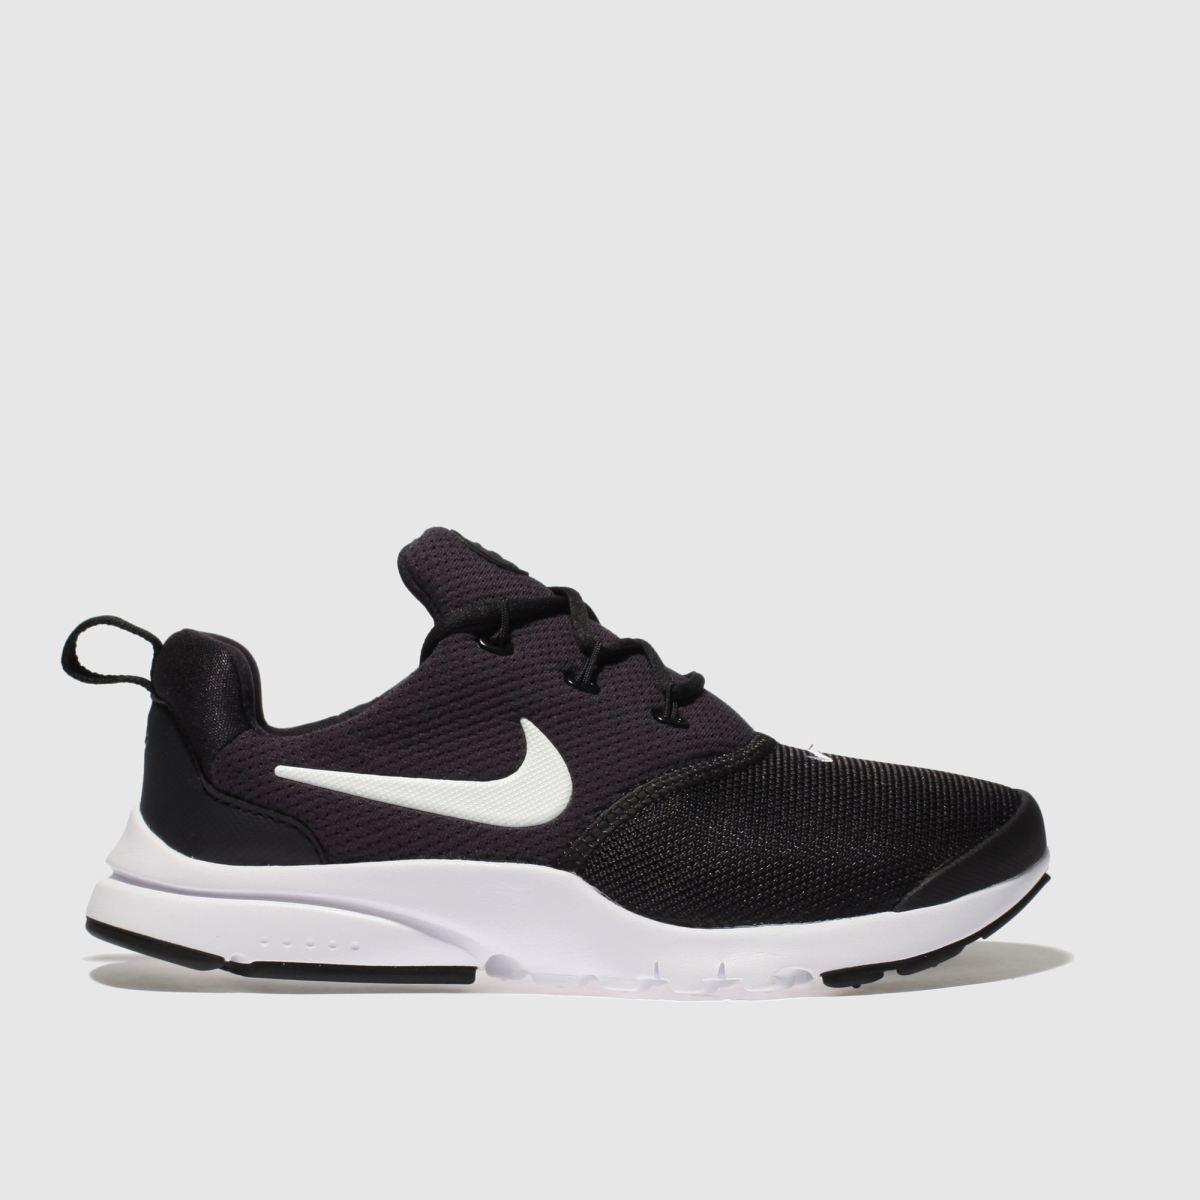 Nike Black & White Presto Fly Trainers Junior